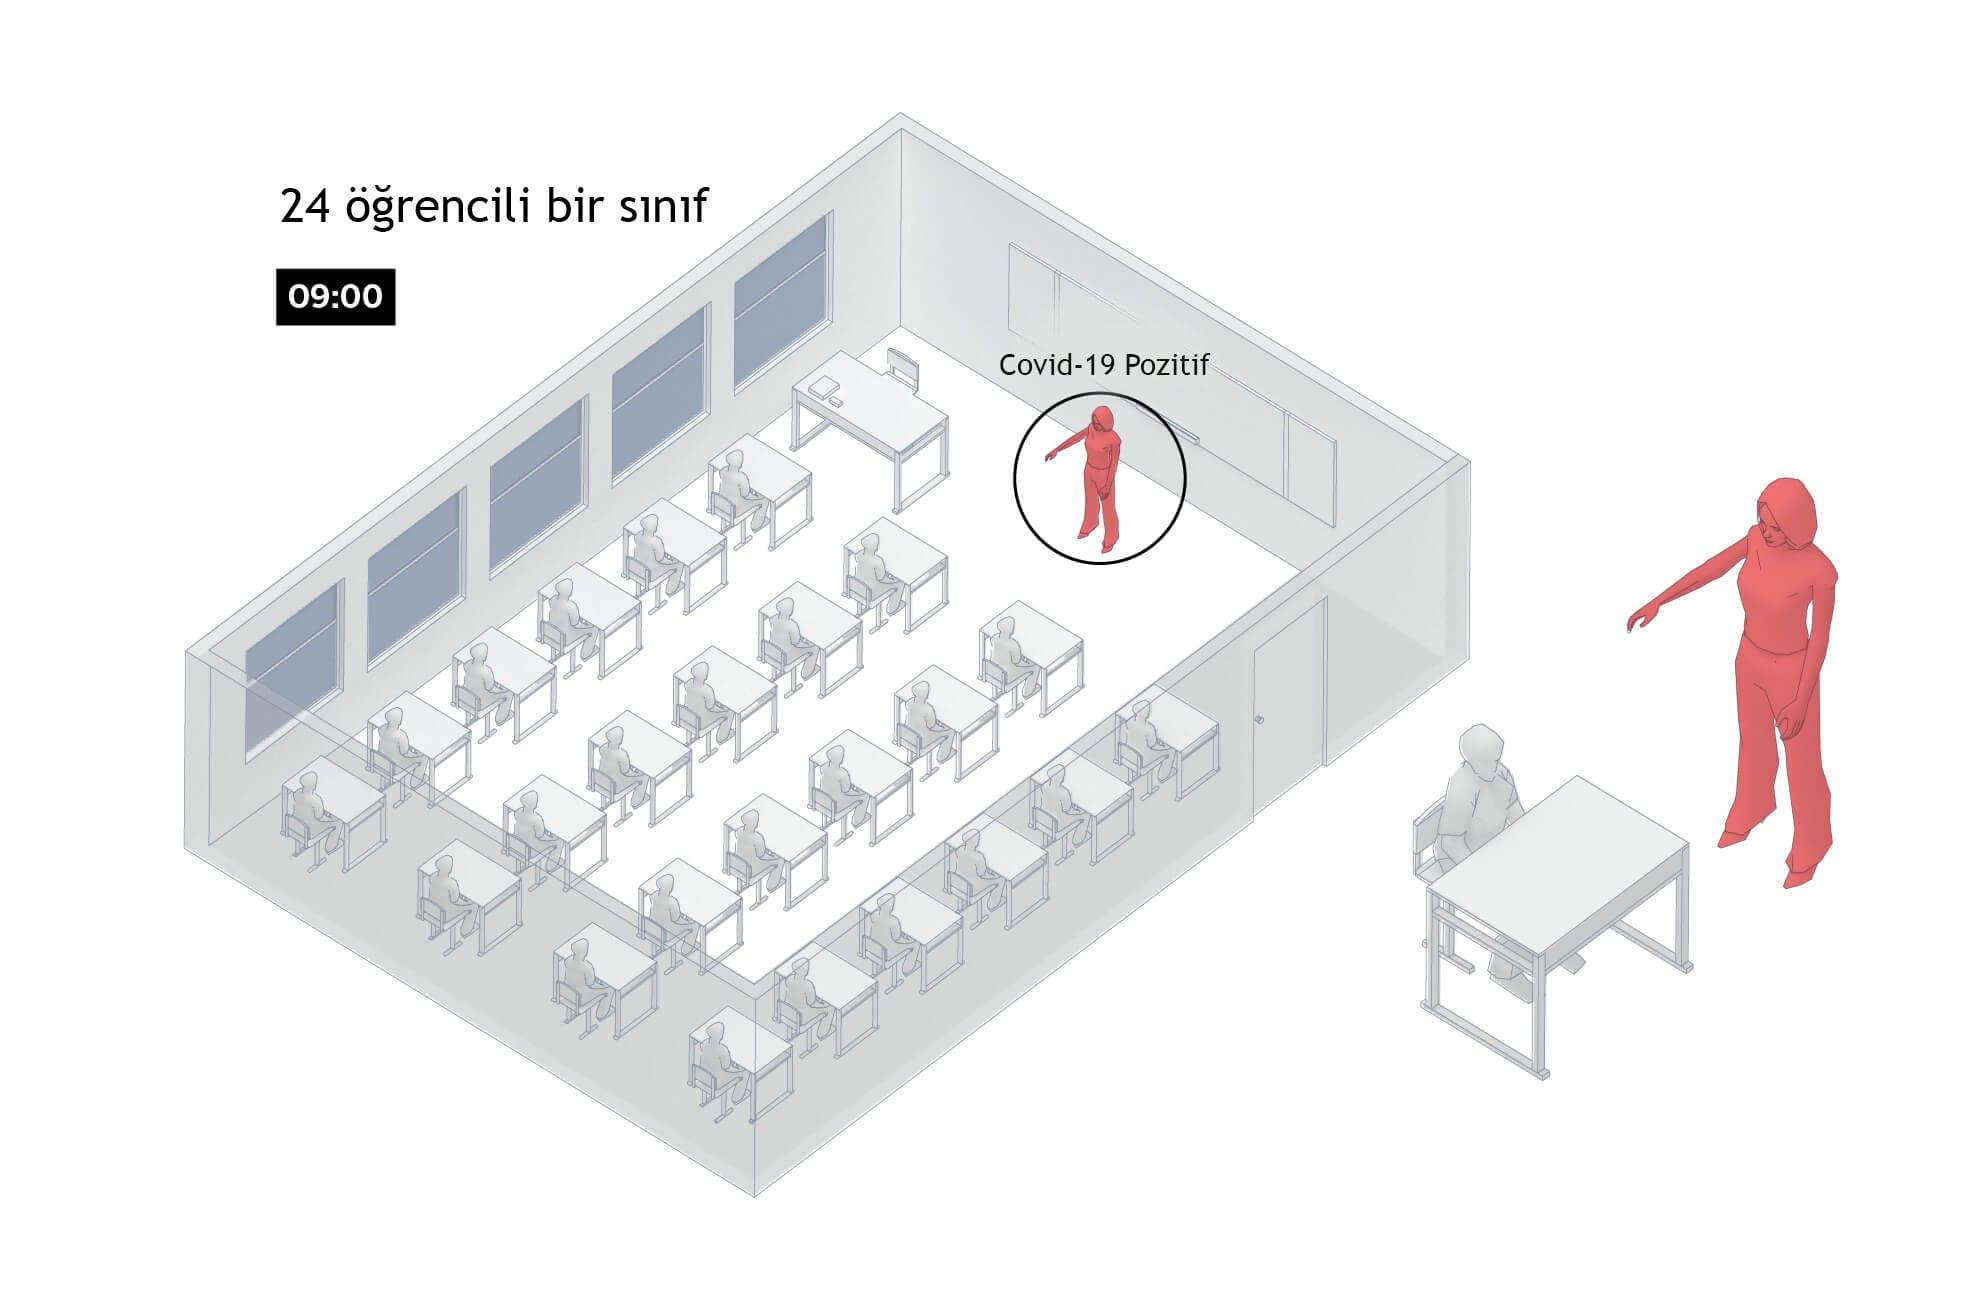 Koronavirüs Okulda Nasıl Yayılır - 1. Aşama